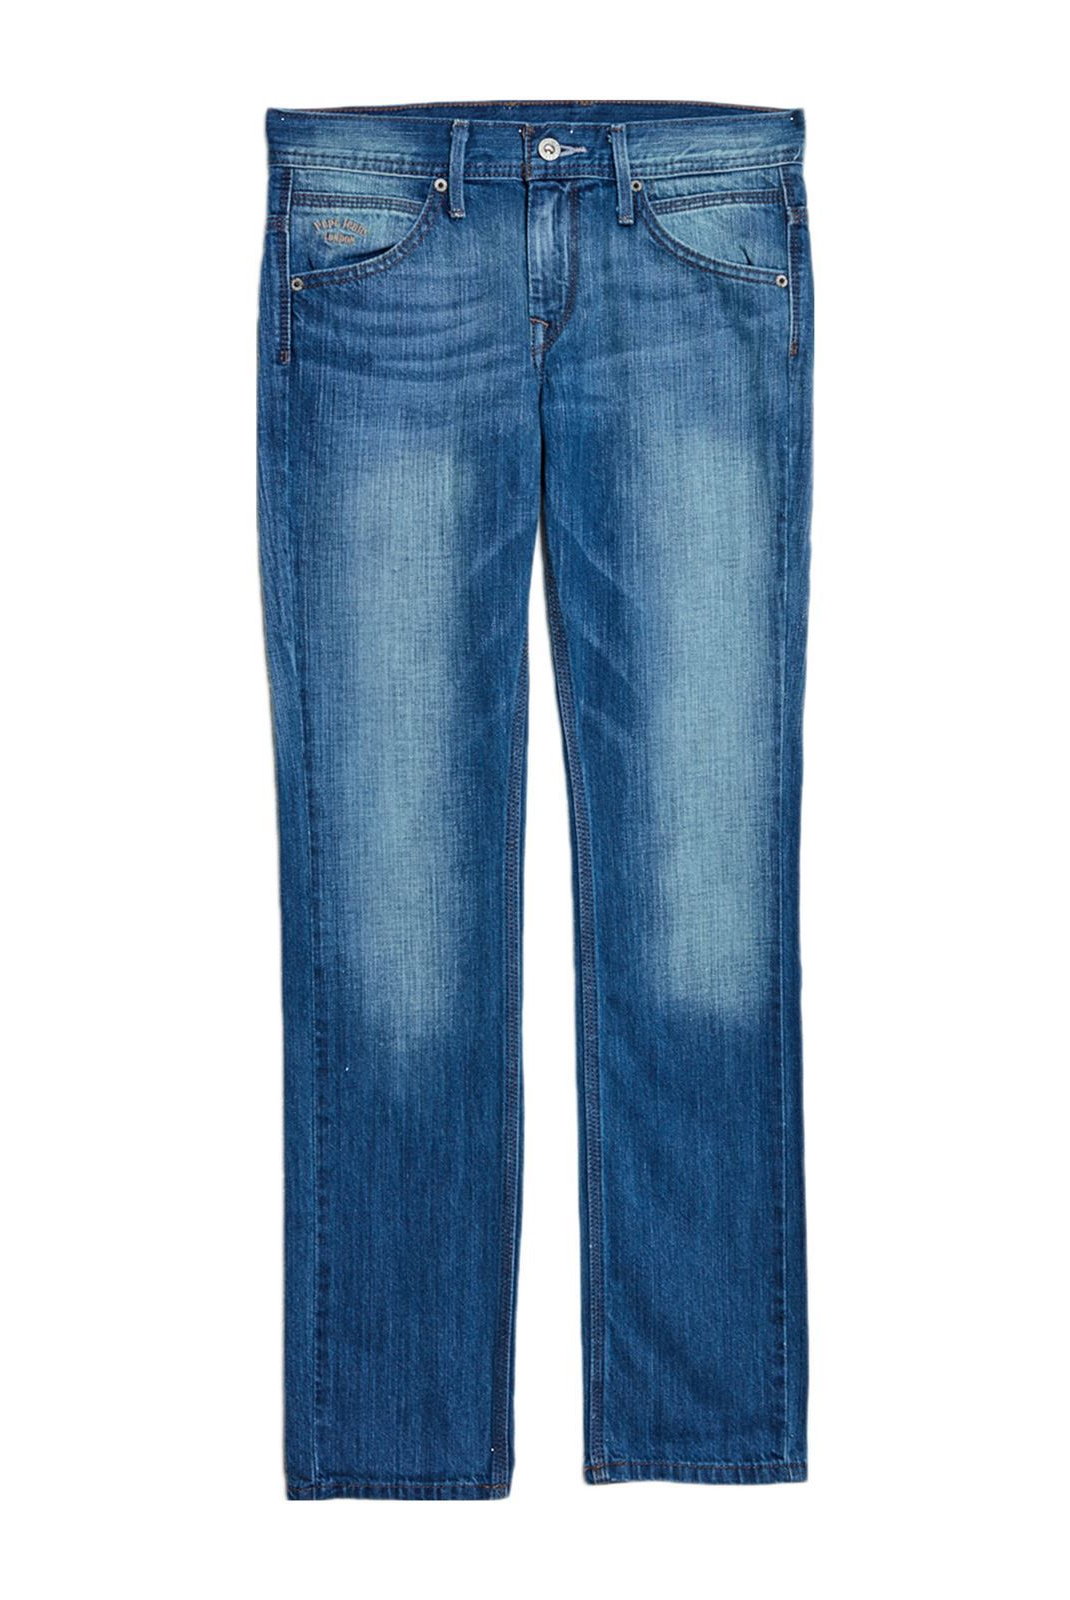 Bas  Pepe jeans PB200232 bleu